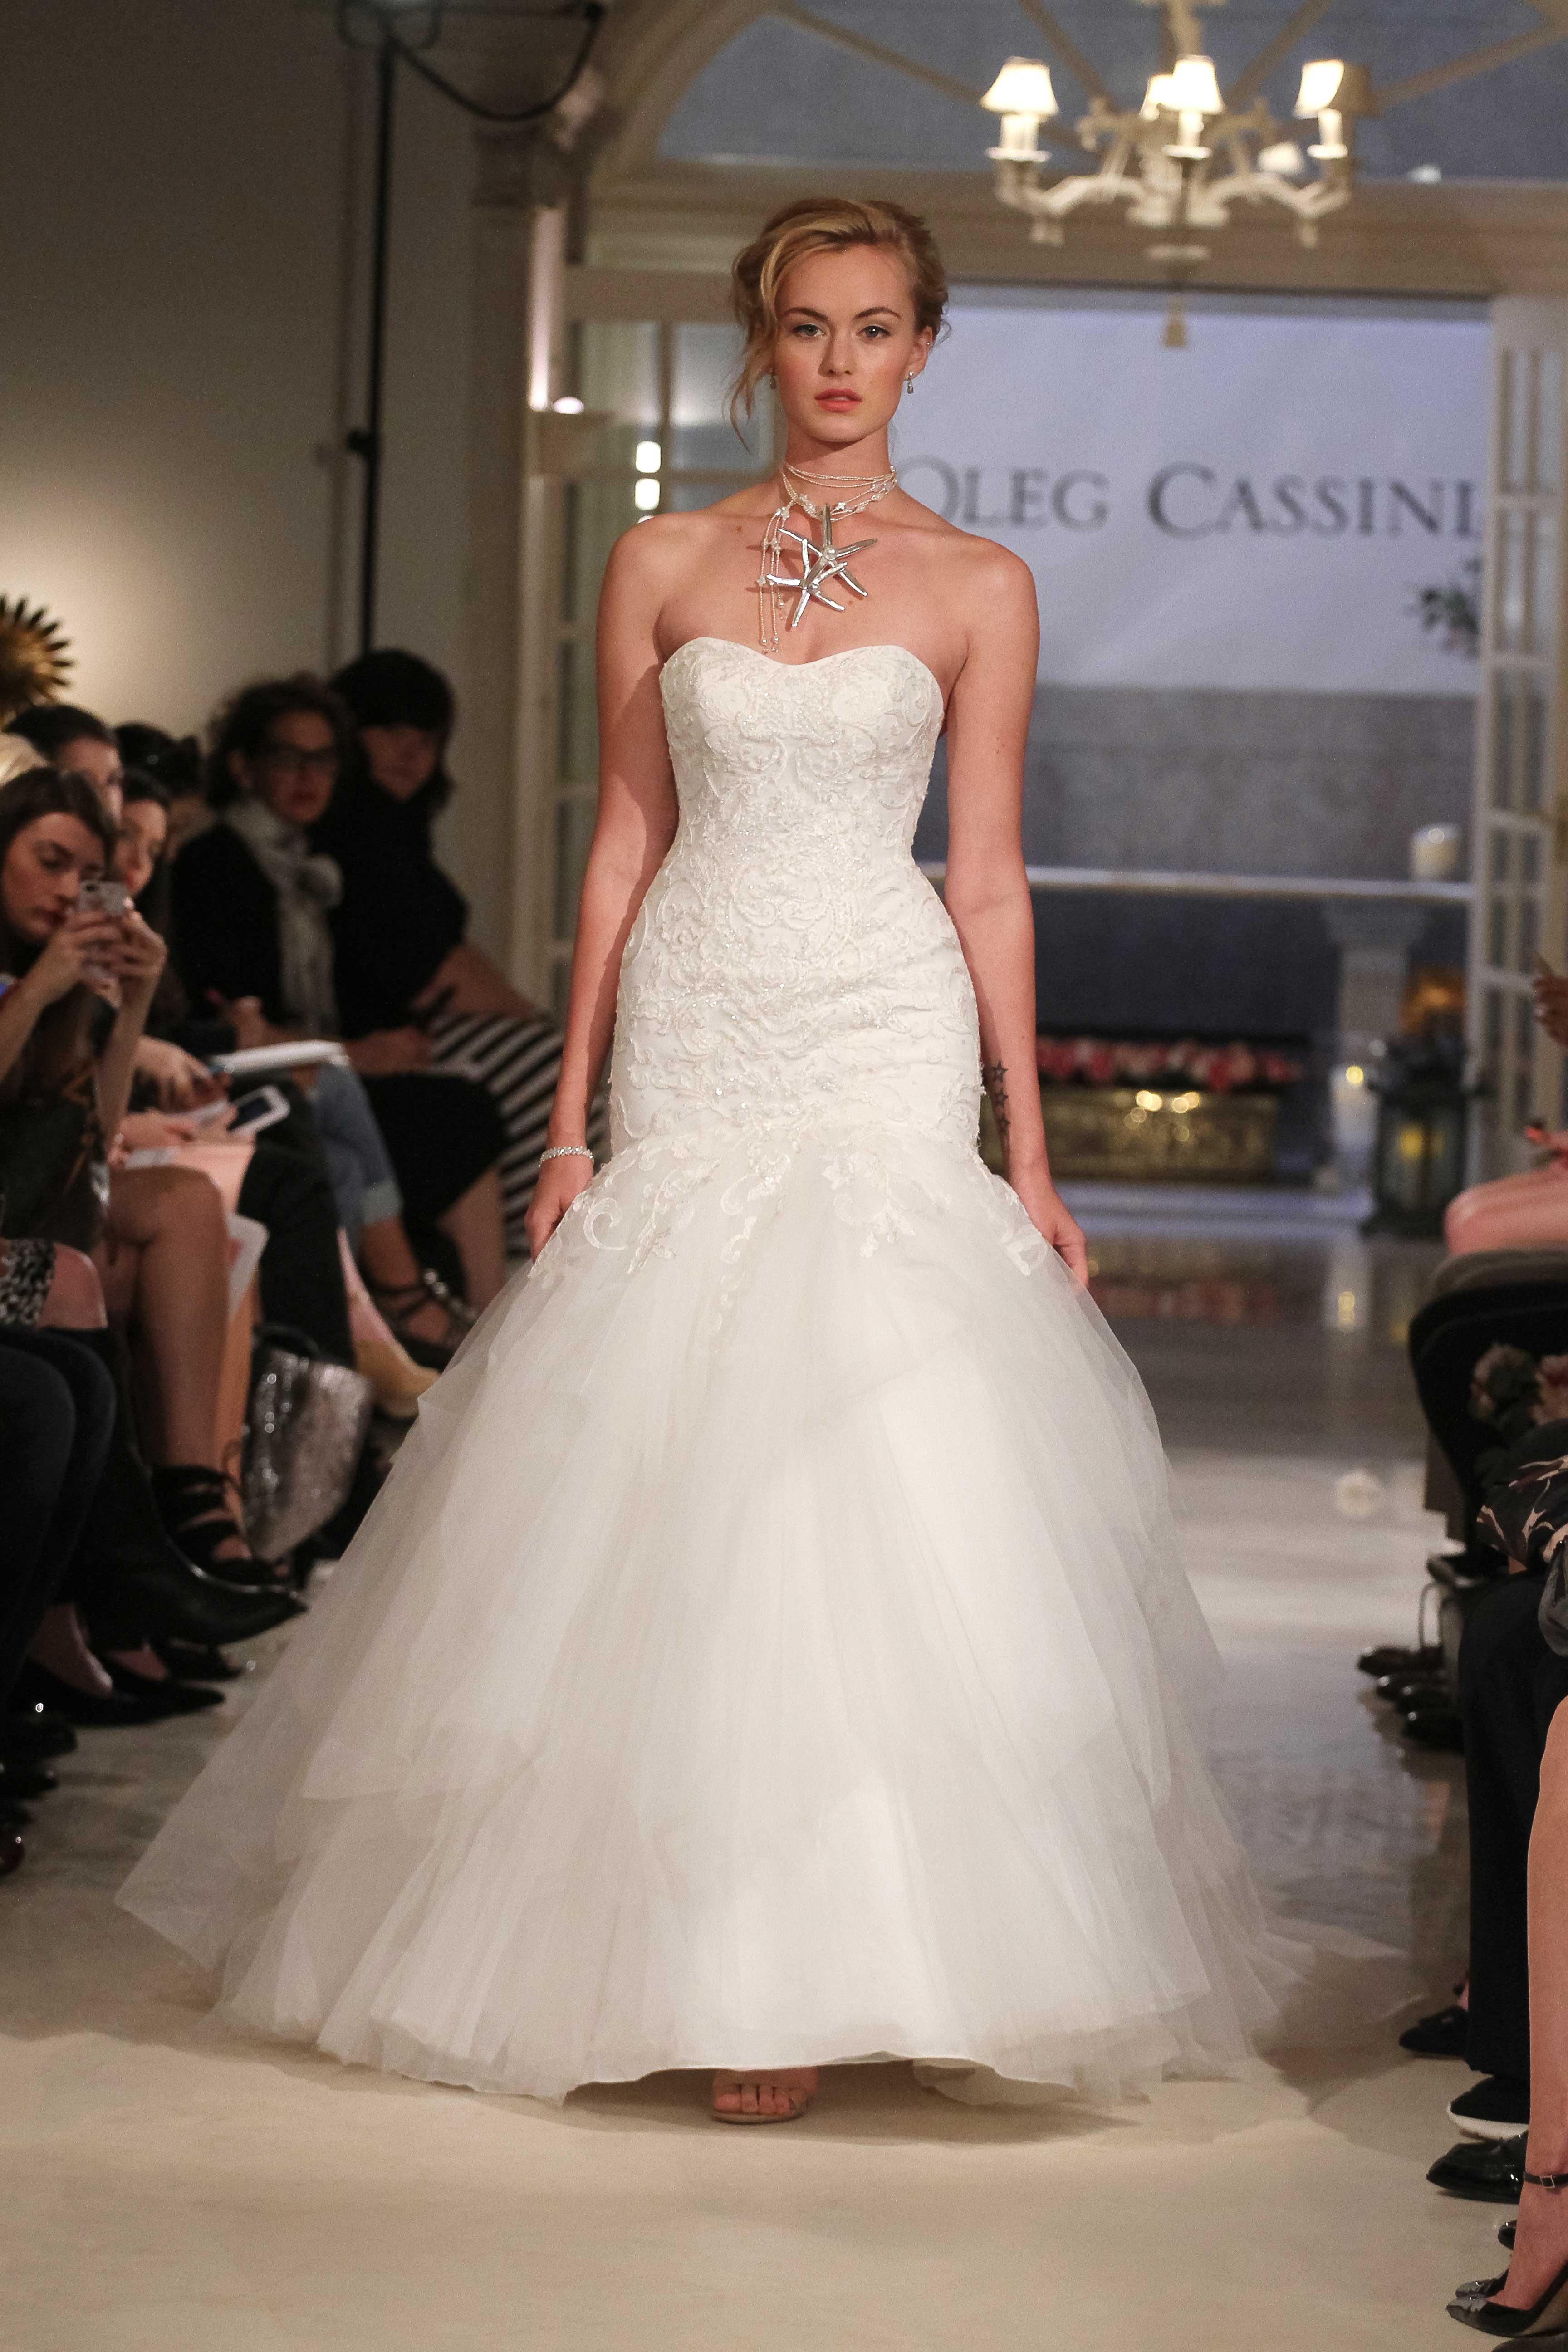 af036c495f93 Oleg Cassini at David's Bridal mermaid wedding dress with strapless  sweetheart neckline